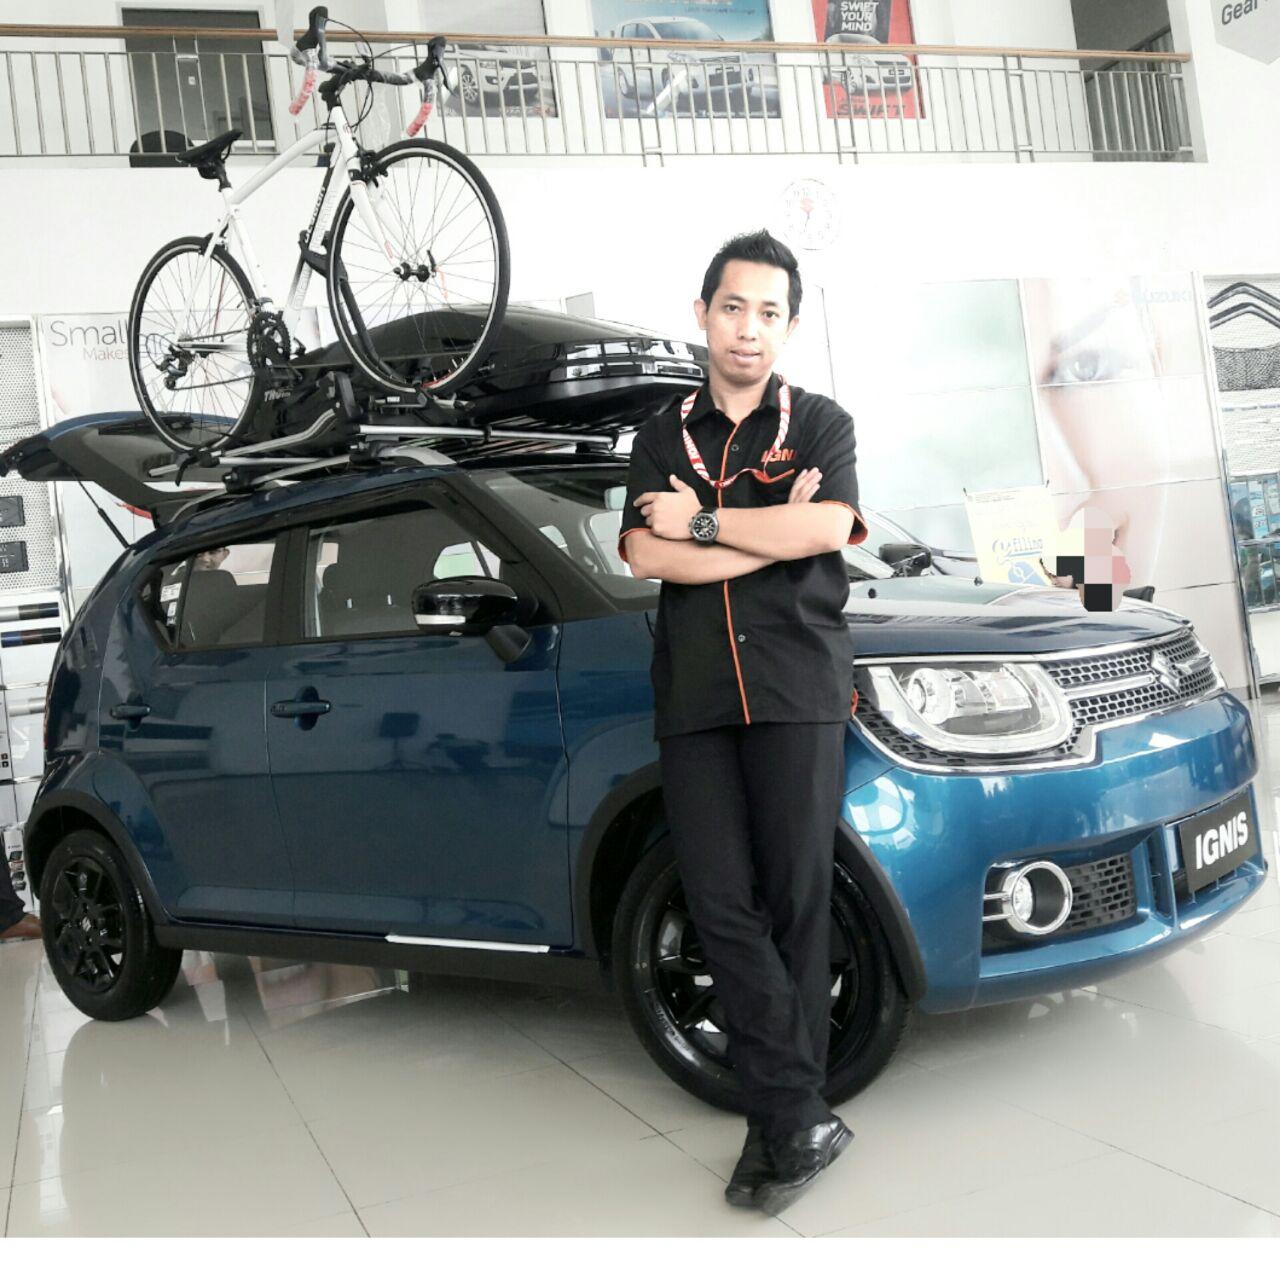 Denny Suzuki Semarang IGNIS - Harga Pricelist Suzuki Mobil Semarang